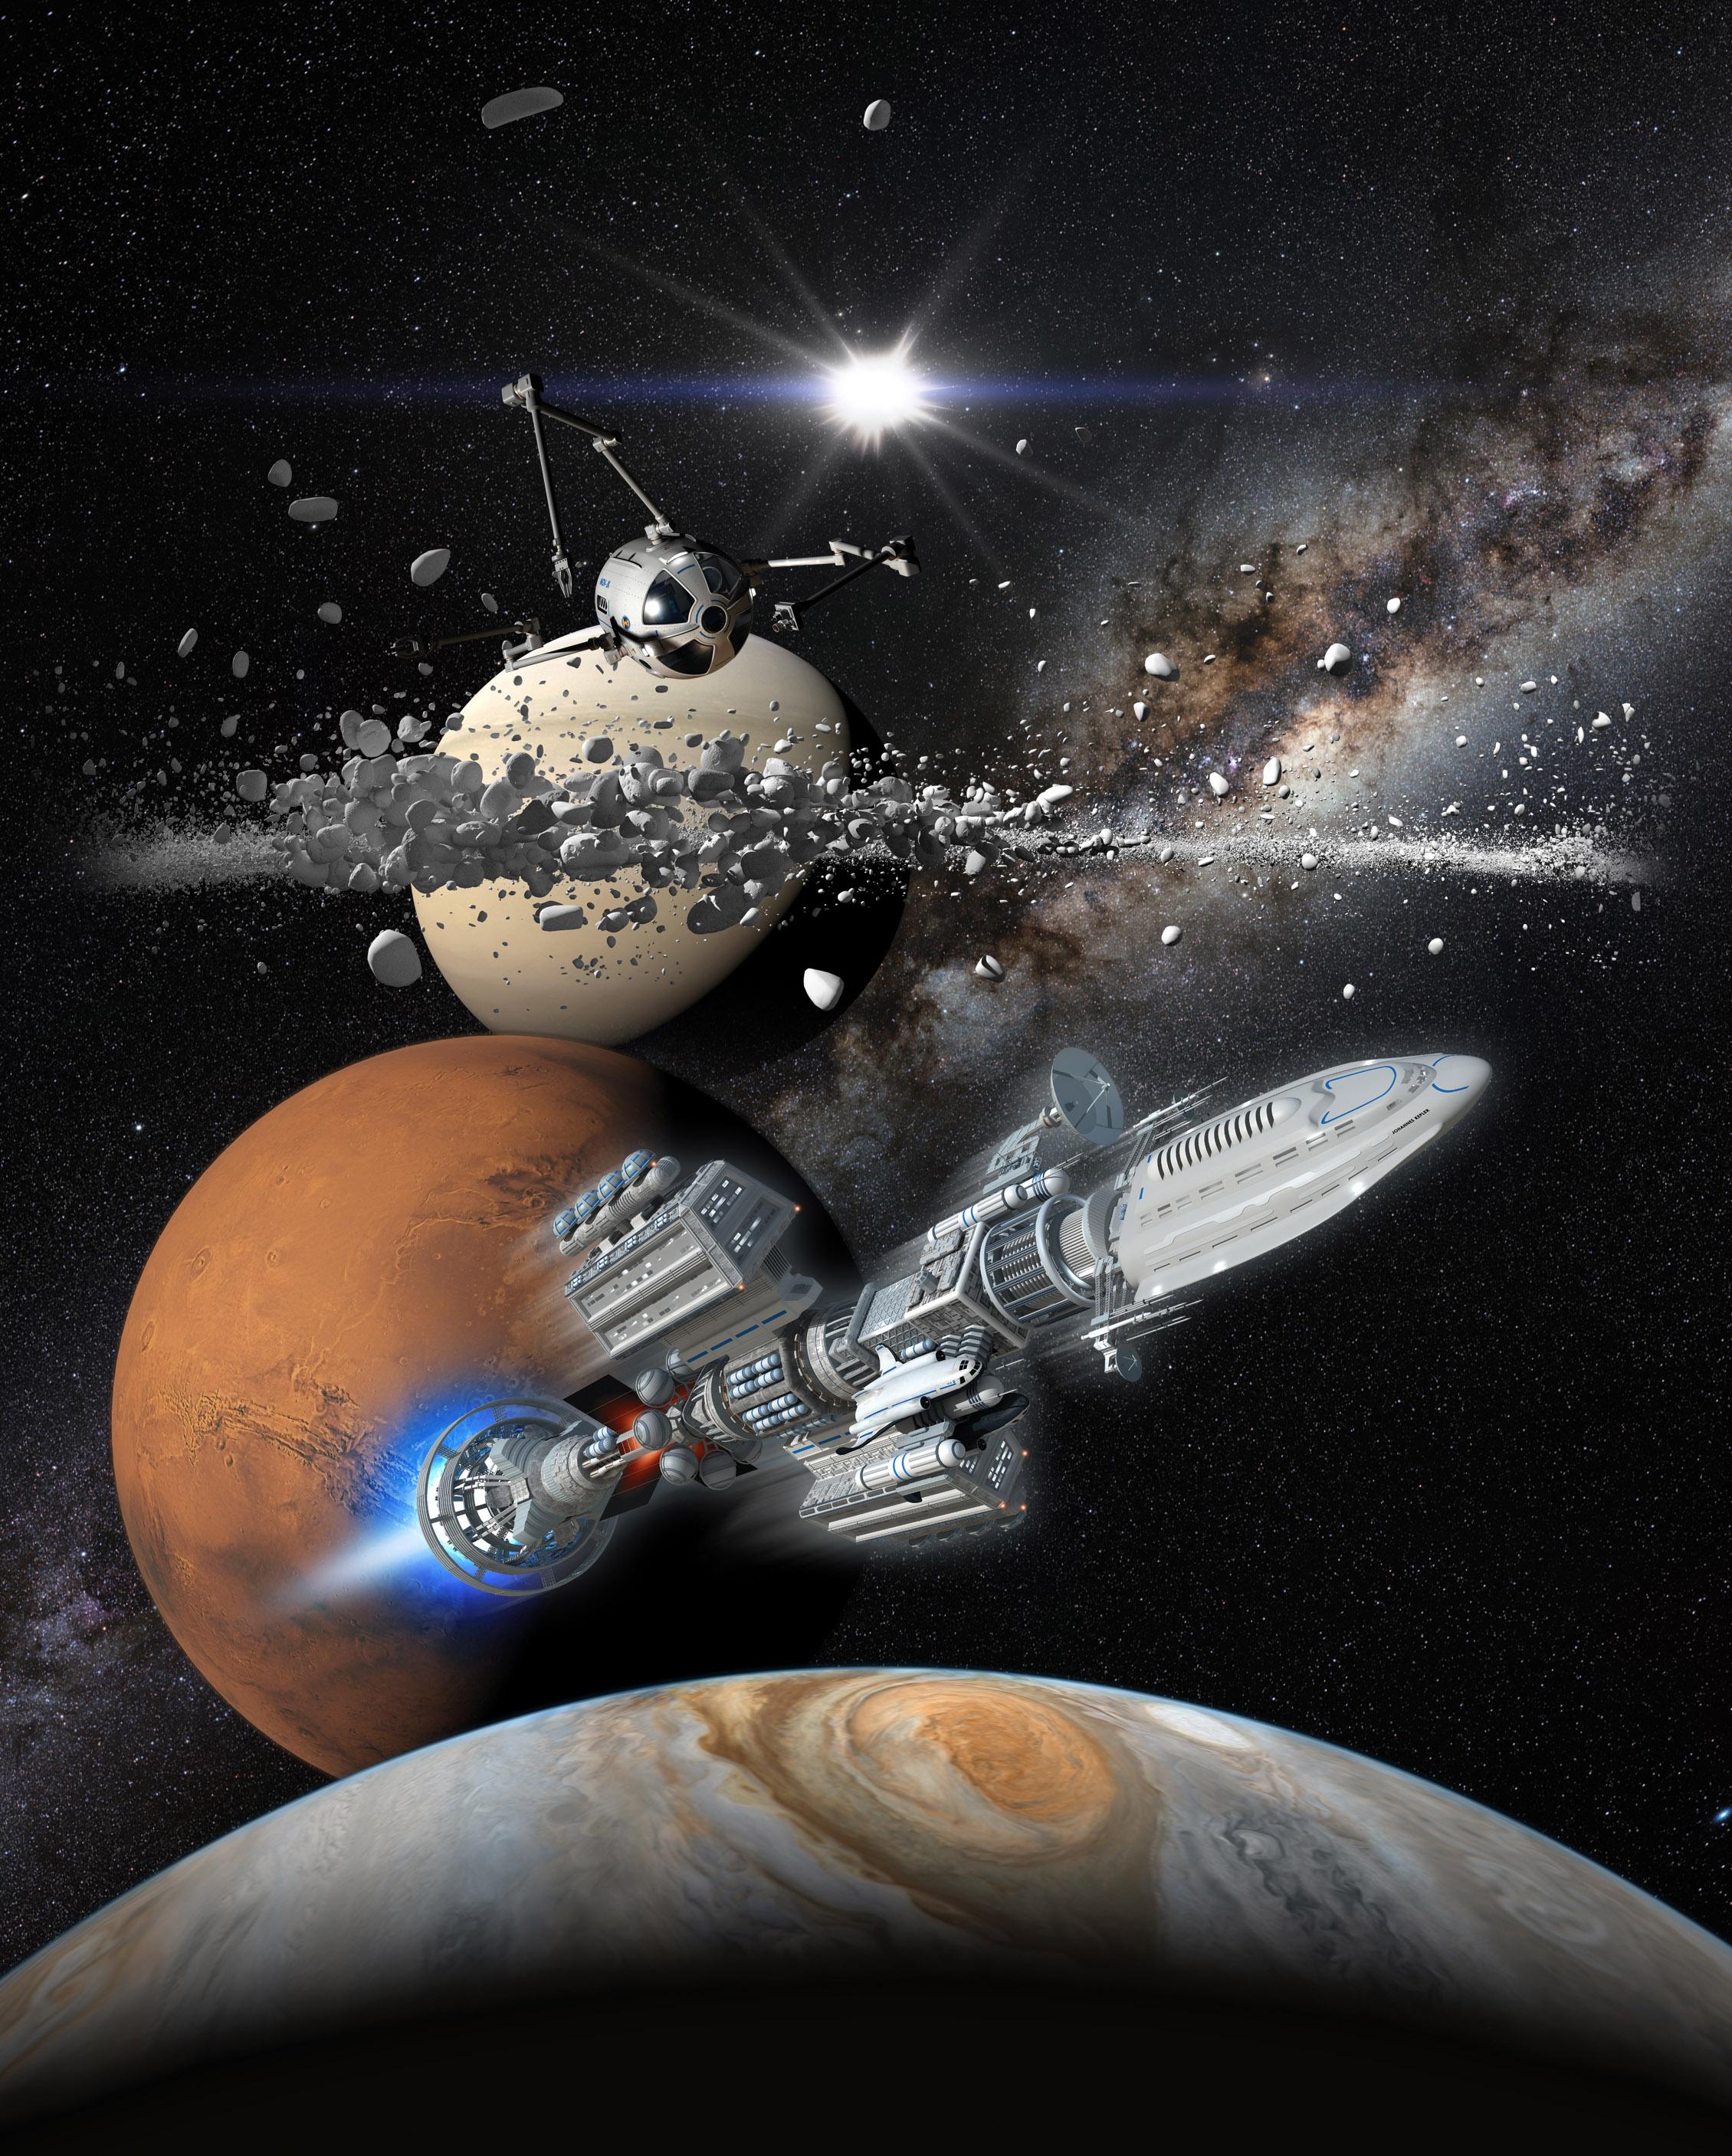 Bilddatei: Planeten_Titelbild_kl(C)LWL,Perdok.jpg